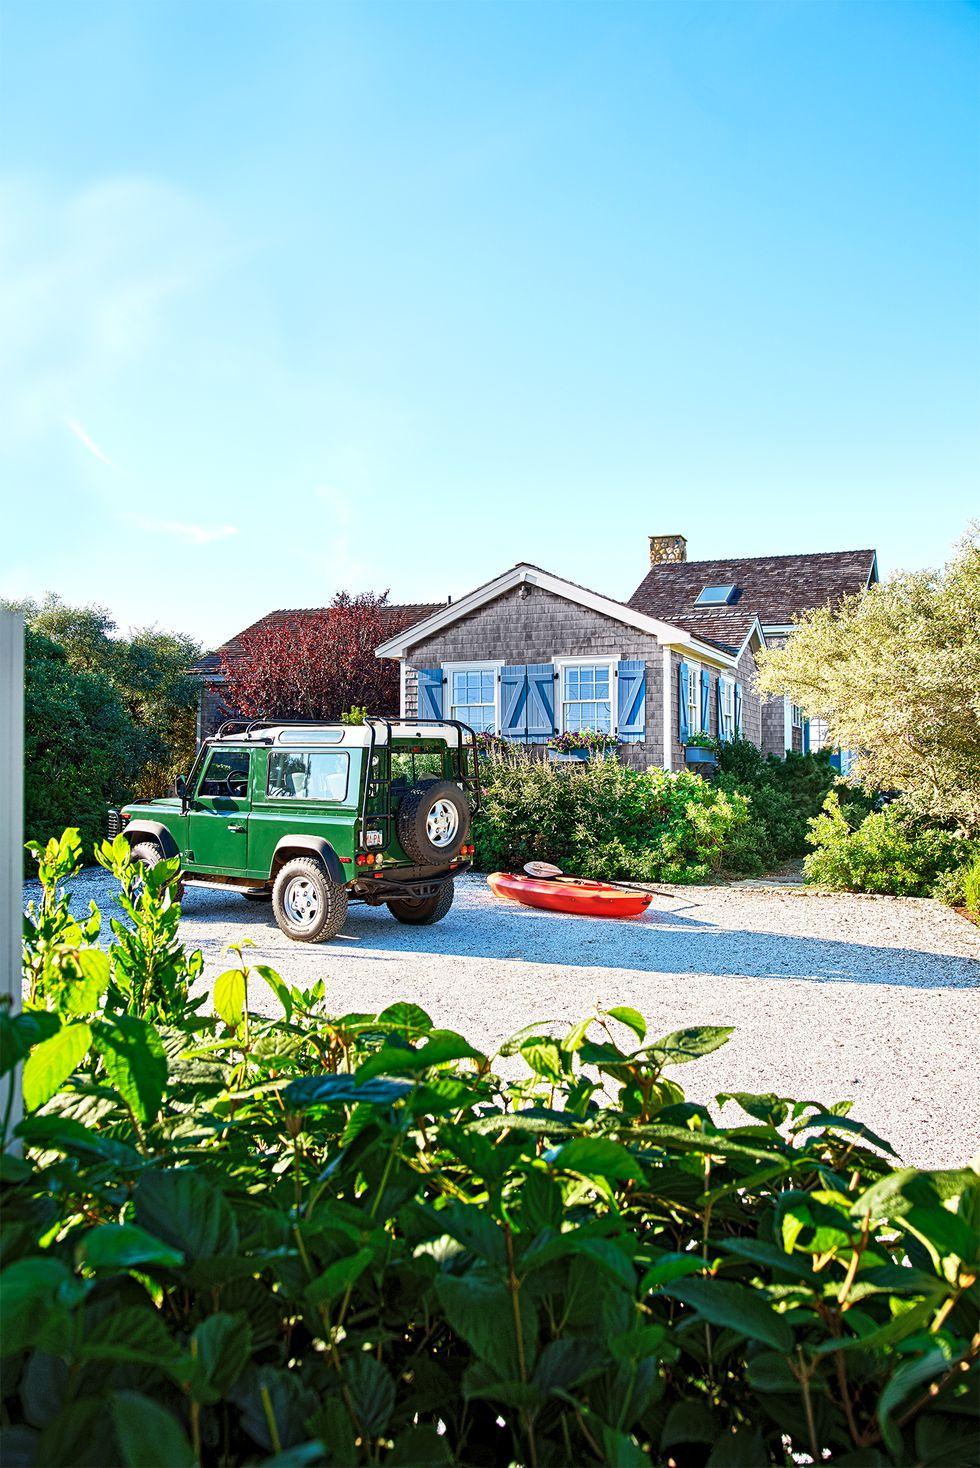 Beach Pretty House Tours-A Funky Quaint Beach Cottage on Marthas Vineyard 1.jpg